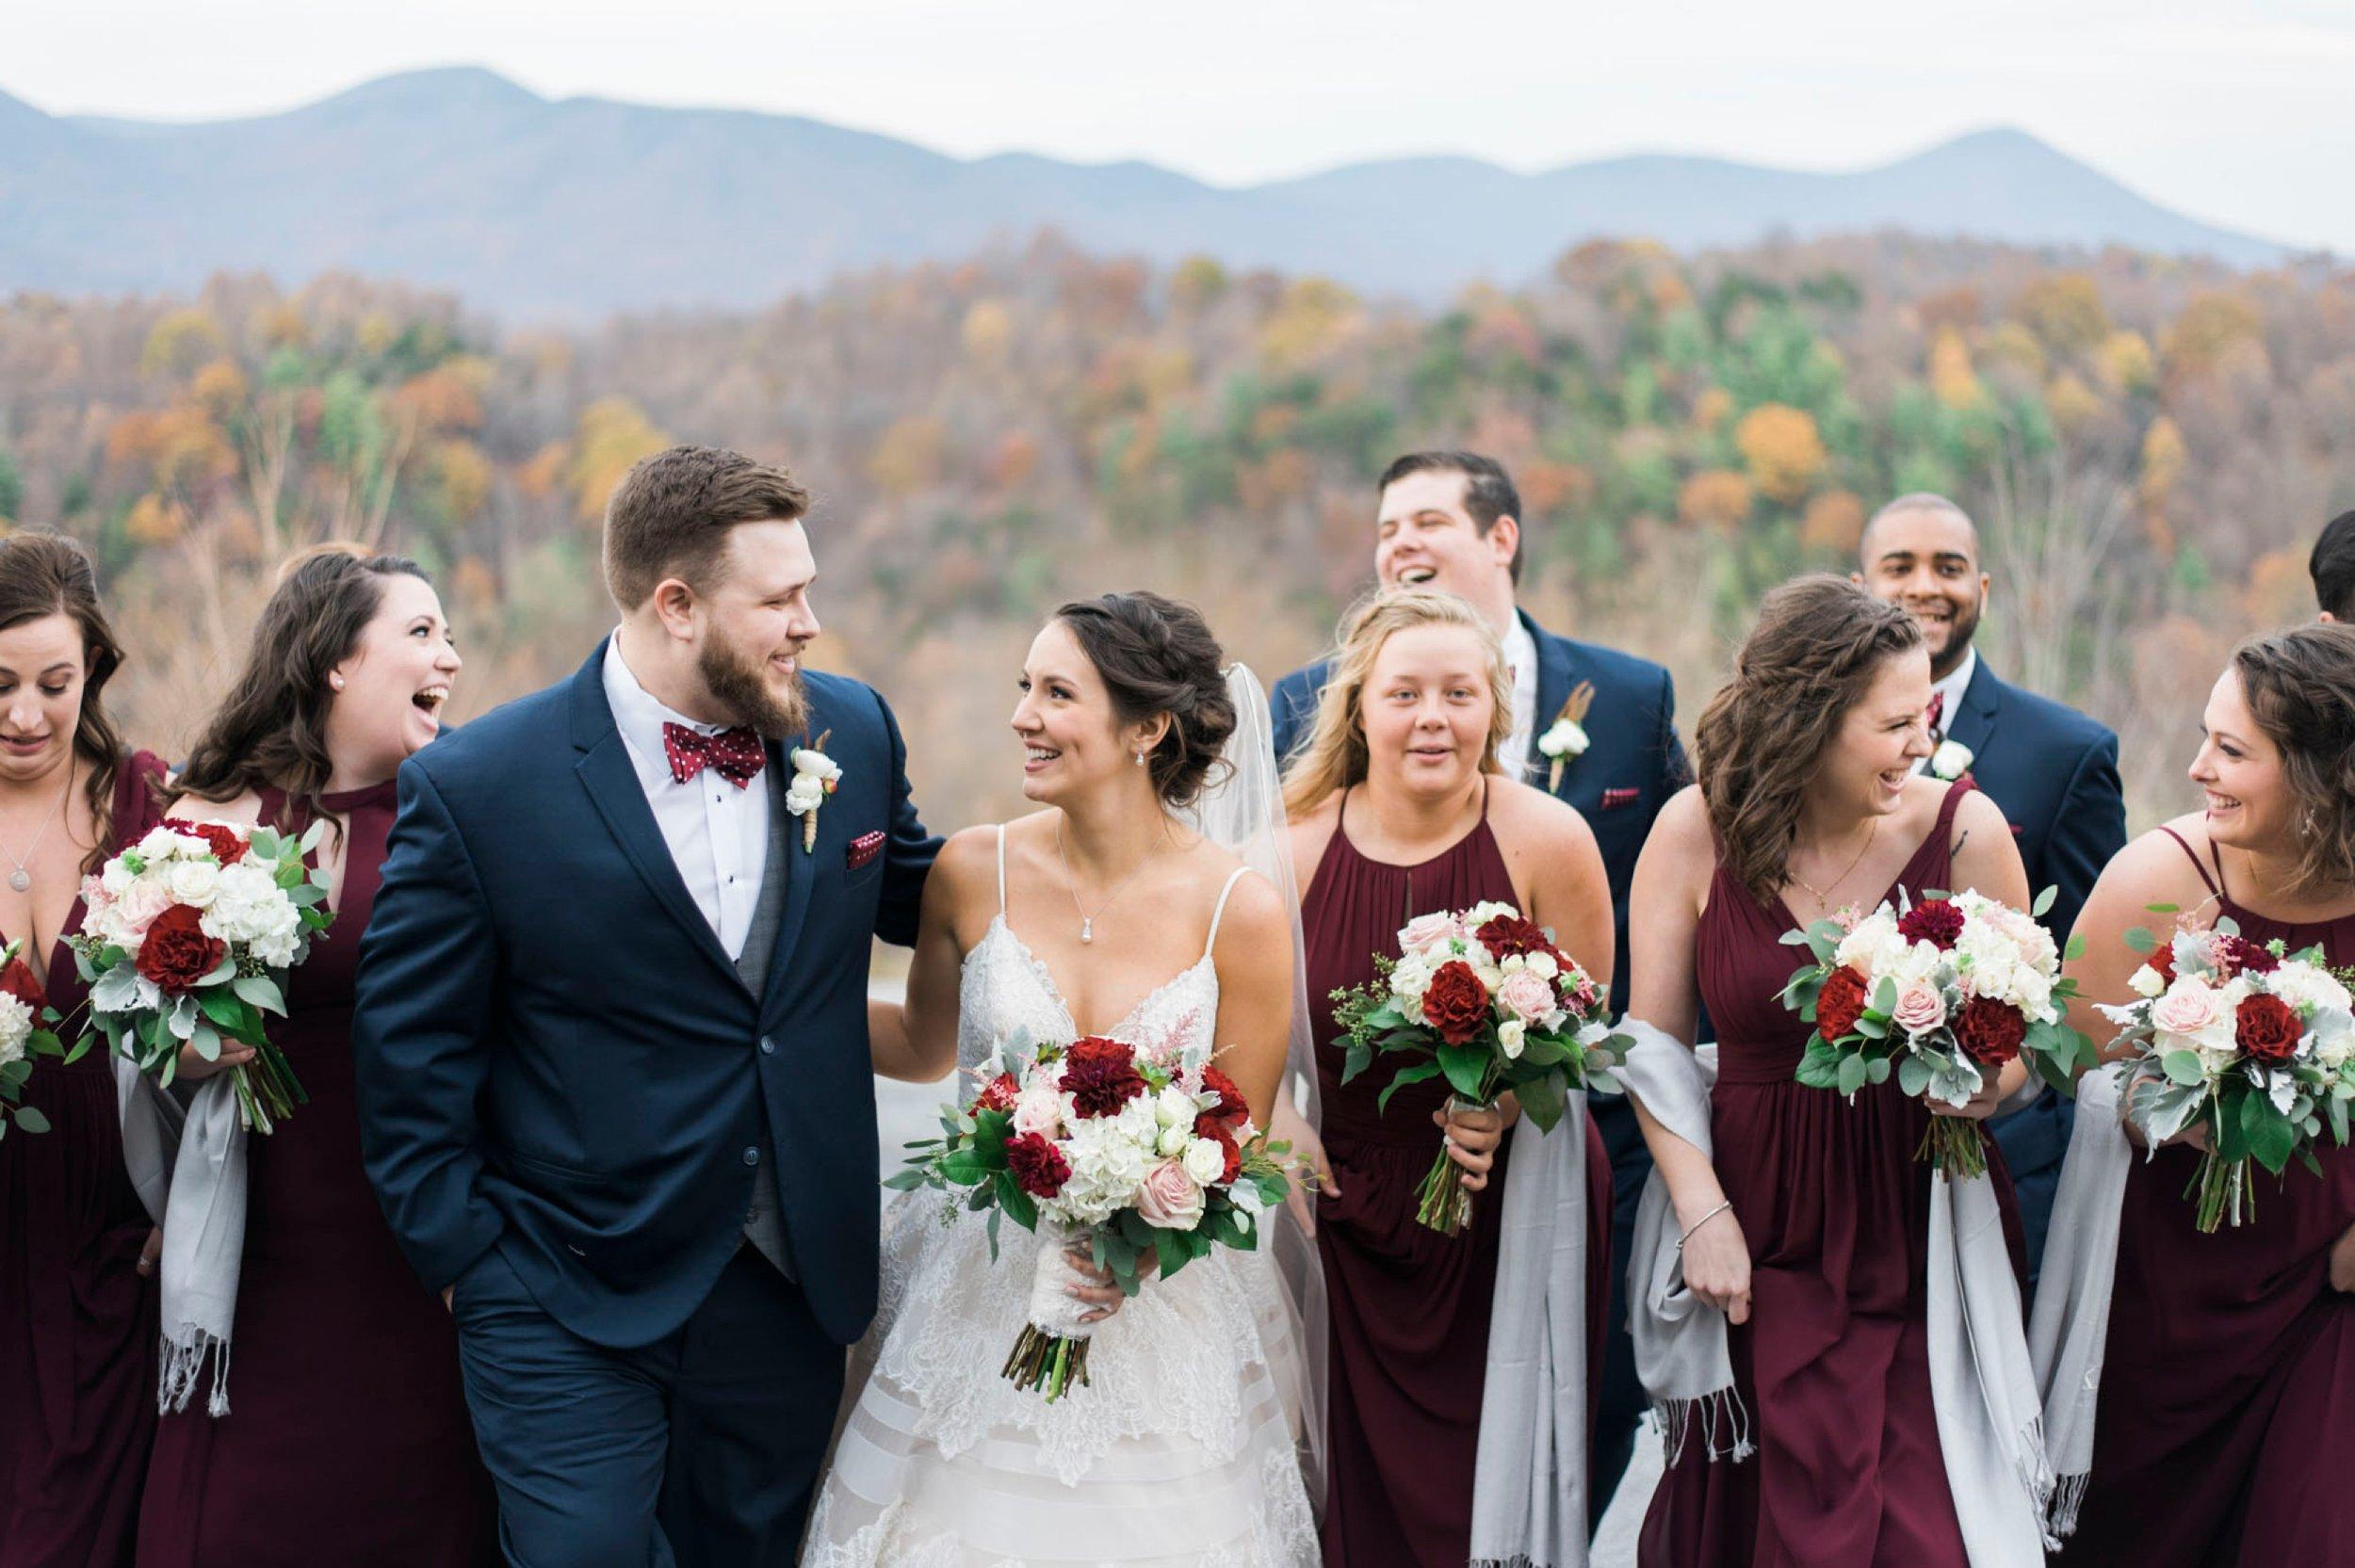 IrvineEstate_LexingtonVA_Wedding_FallWedding_VirginiaWeddingPhotographer 68.jpg